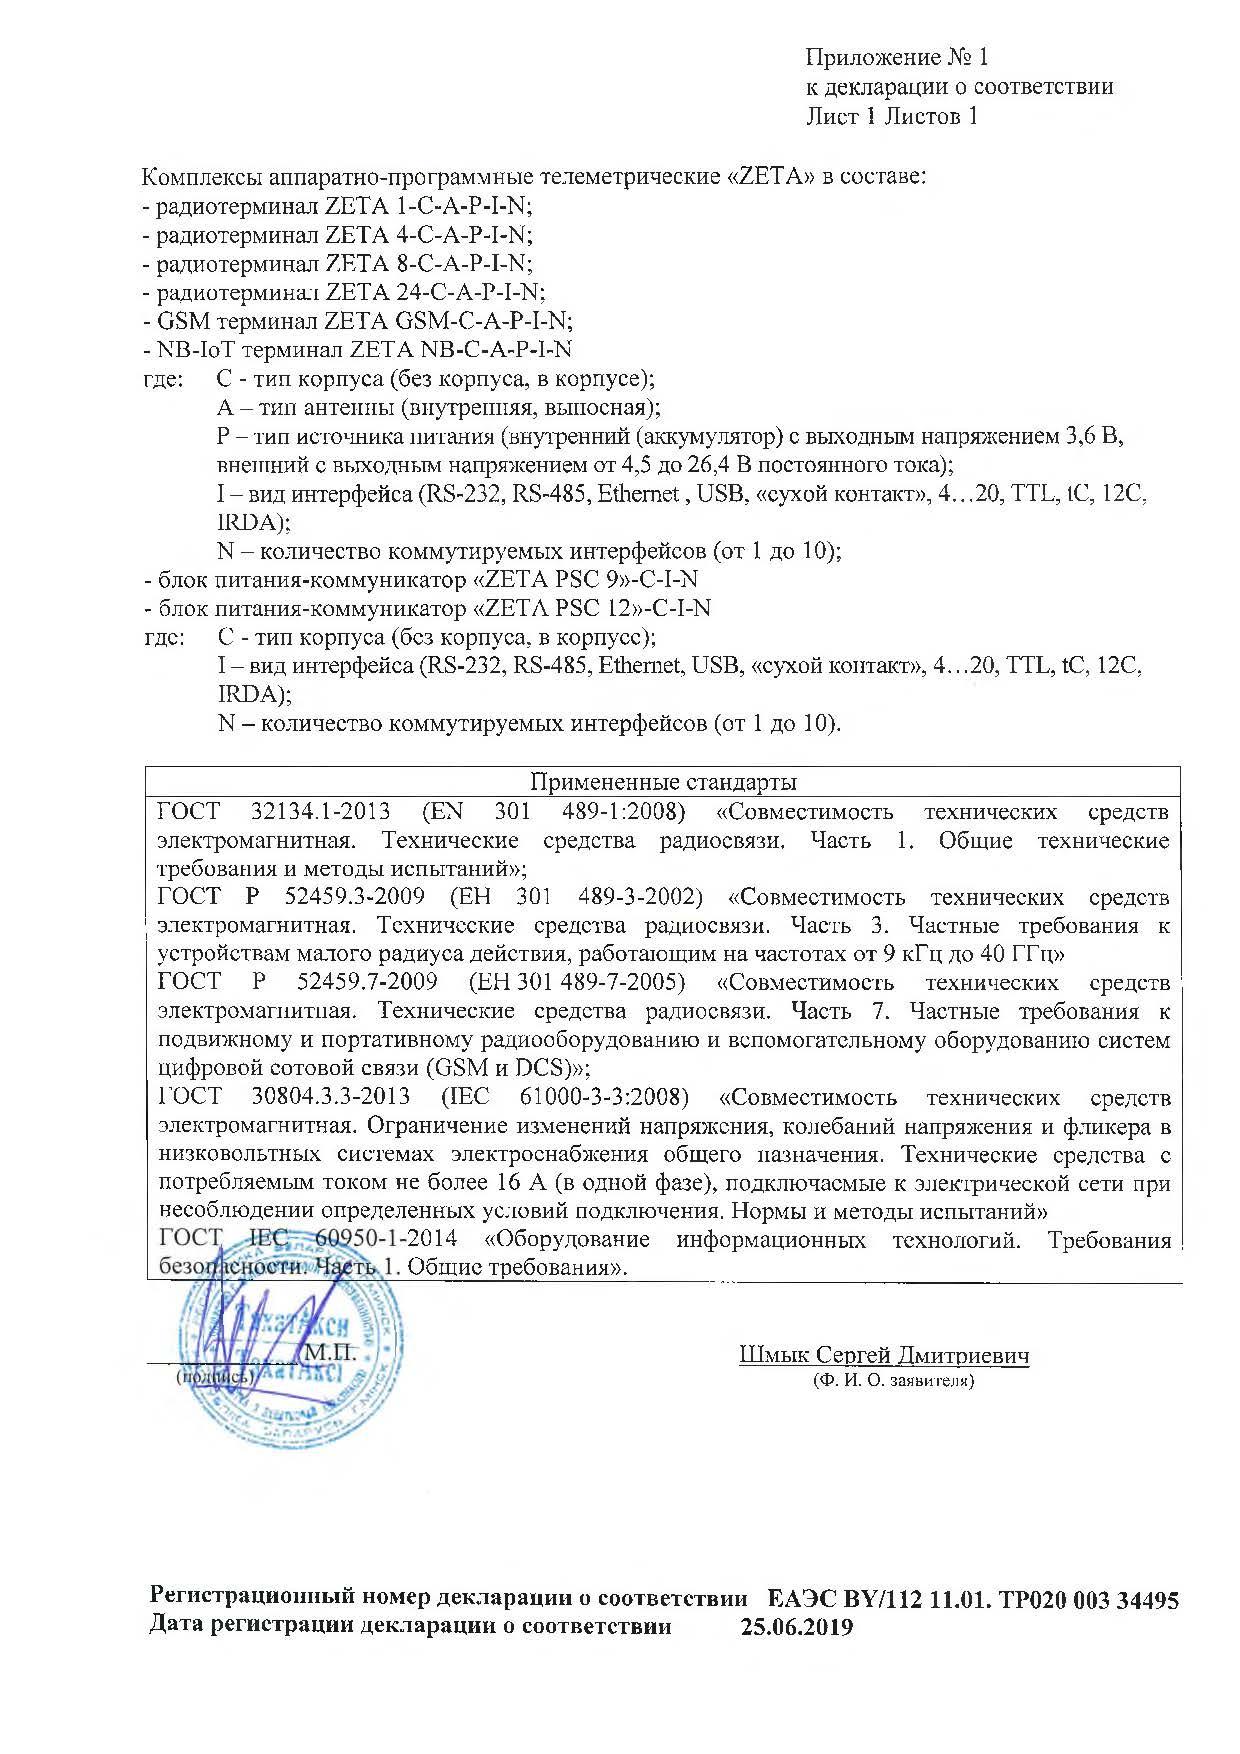 декларация ТС-2